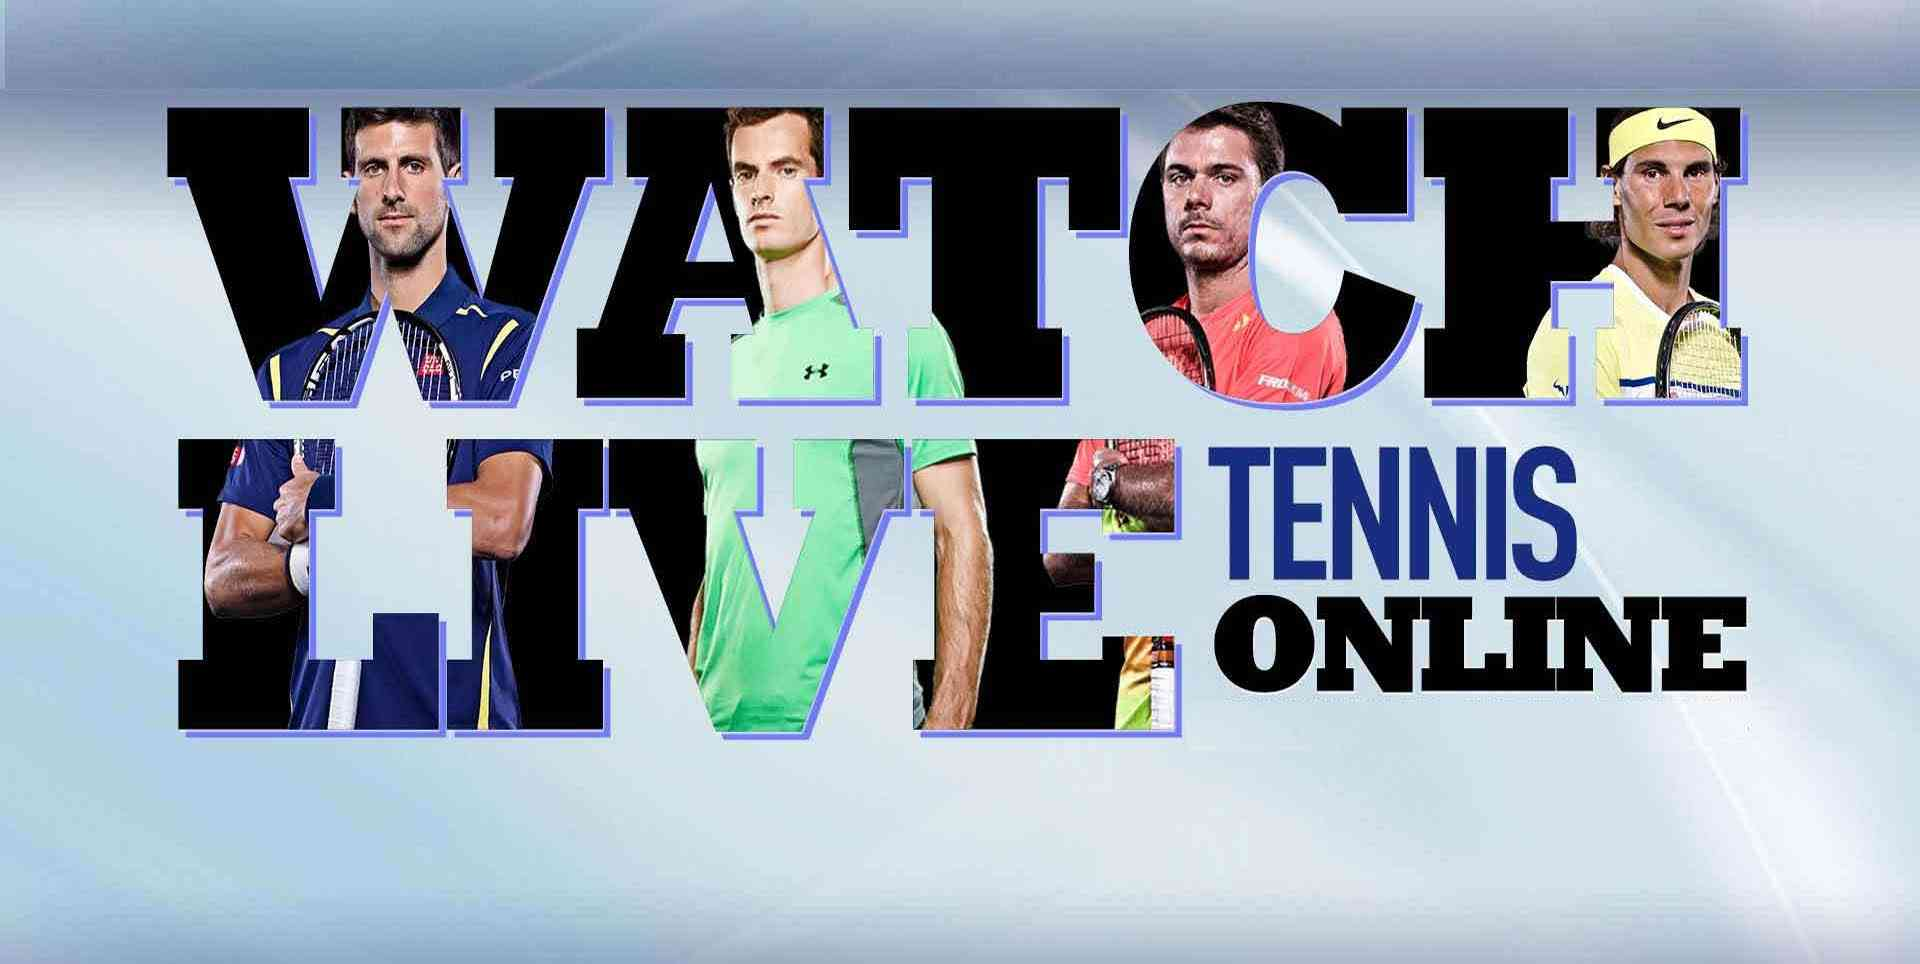 WTA BGL BNP PARIBAS Luxembourg Open